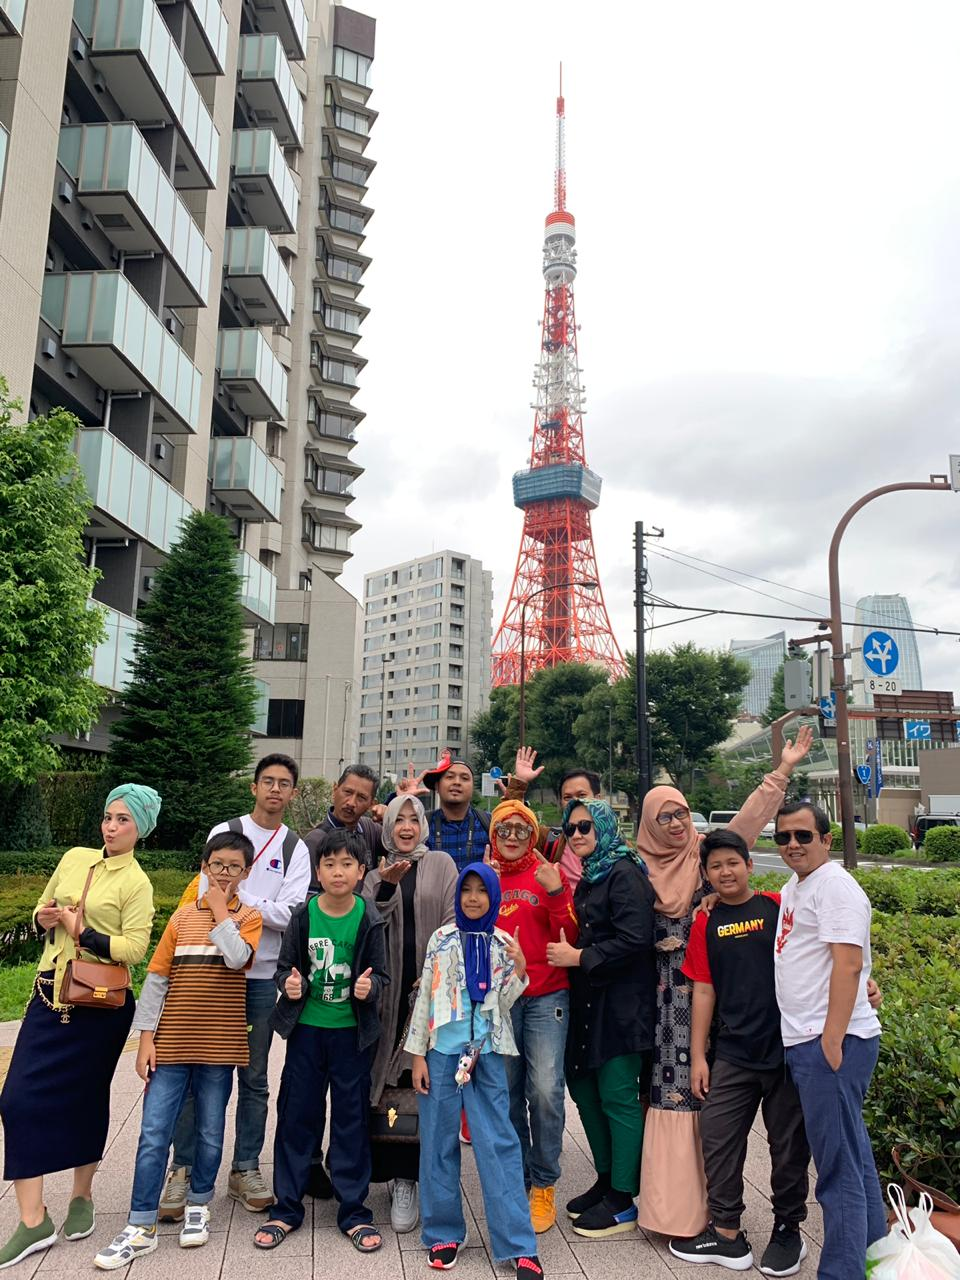 TOKYO DISNEYLAND 6-11 JULI 2019